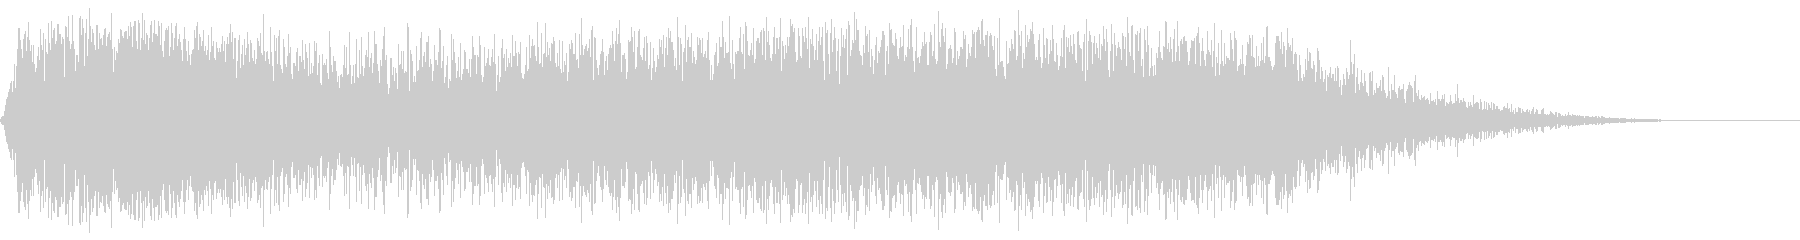 SynthSweep EC03_36_5の未再生の波形